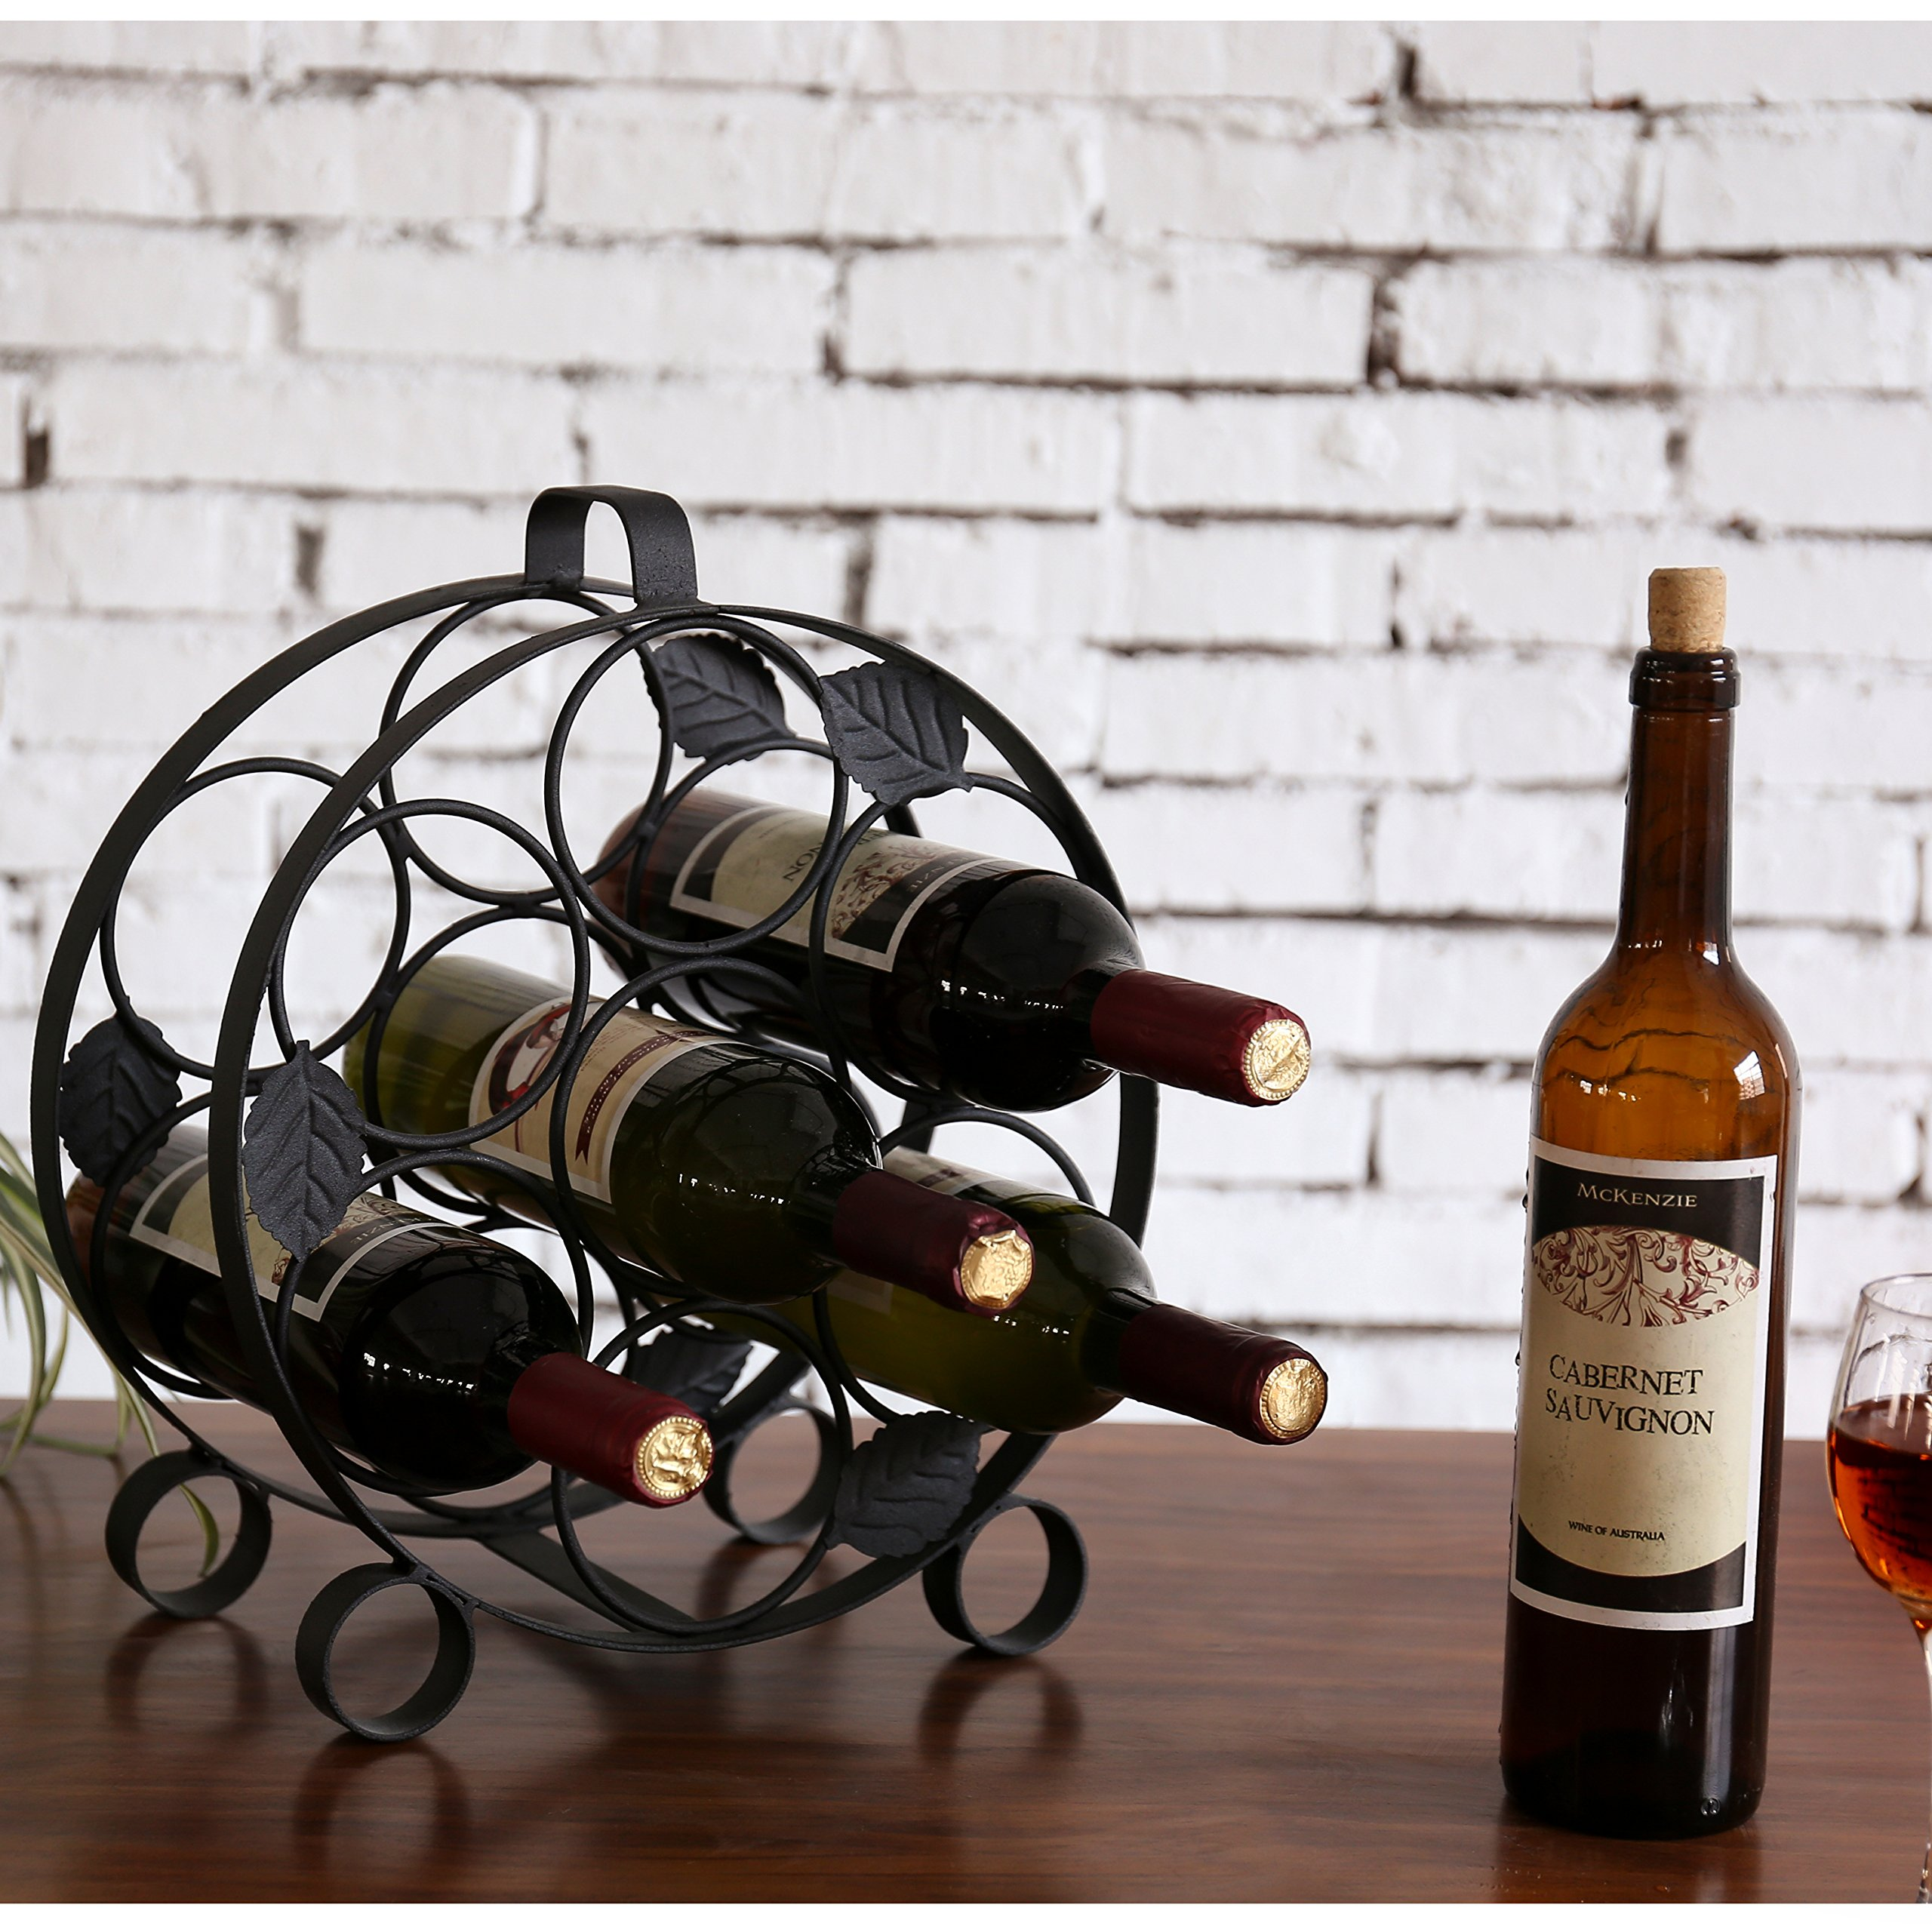 Modern Countertop Circular Black Metal Wine Bottle Display Rack - Holds up to 7 Bottles